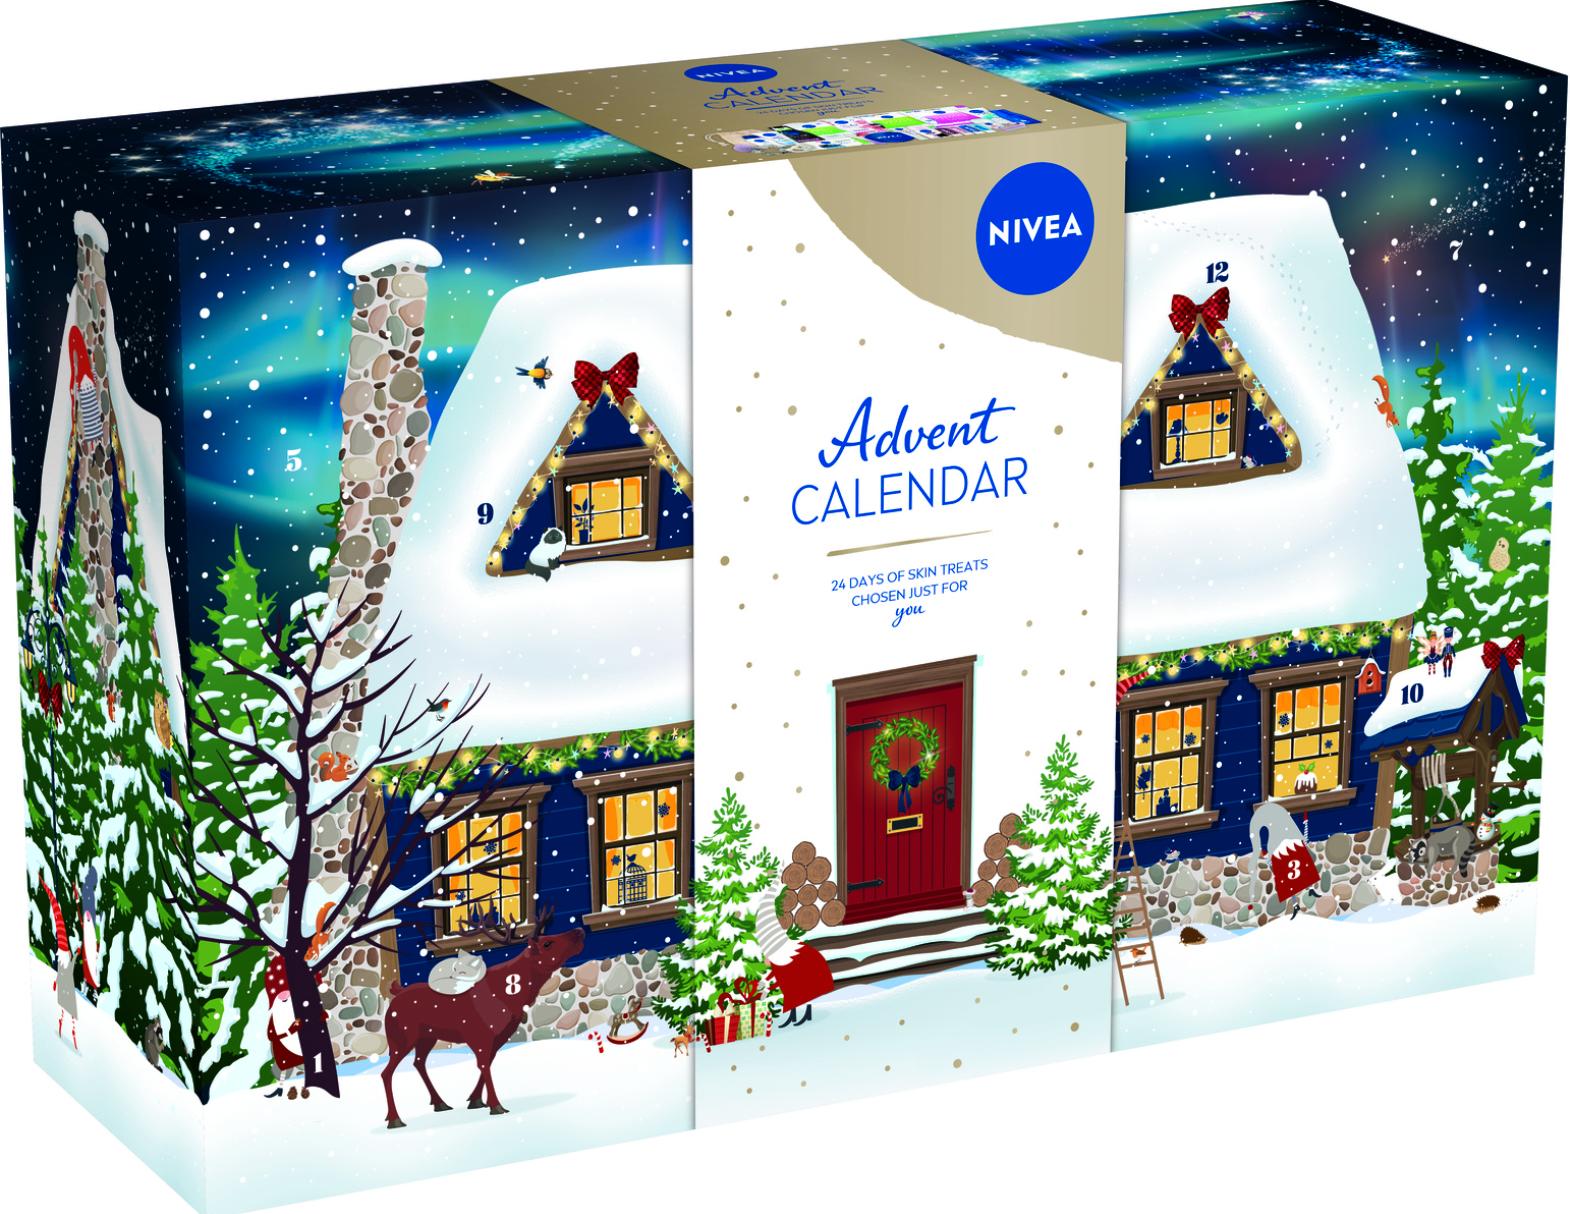 https://ion.lyko.com/t/t?a=1536992143&as=1338715118&t=2&tk=1&epi=JULEKALENDER_VOSKNE_NIVEA&url=https://lyko.com/no/nivea/nivea-giftpack-advent-calendar-2021